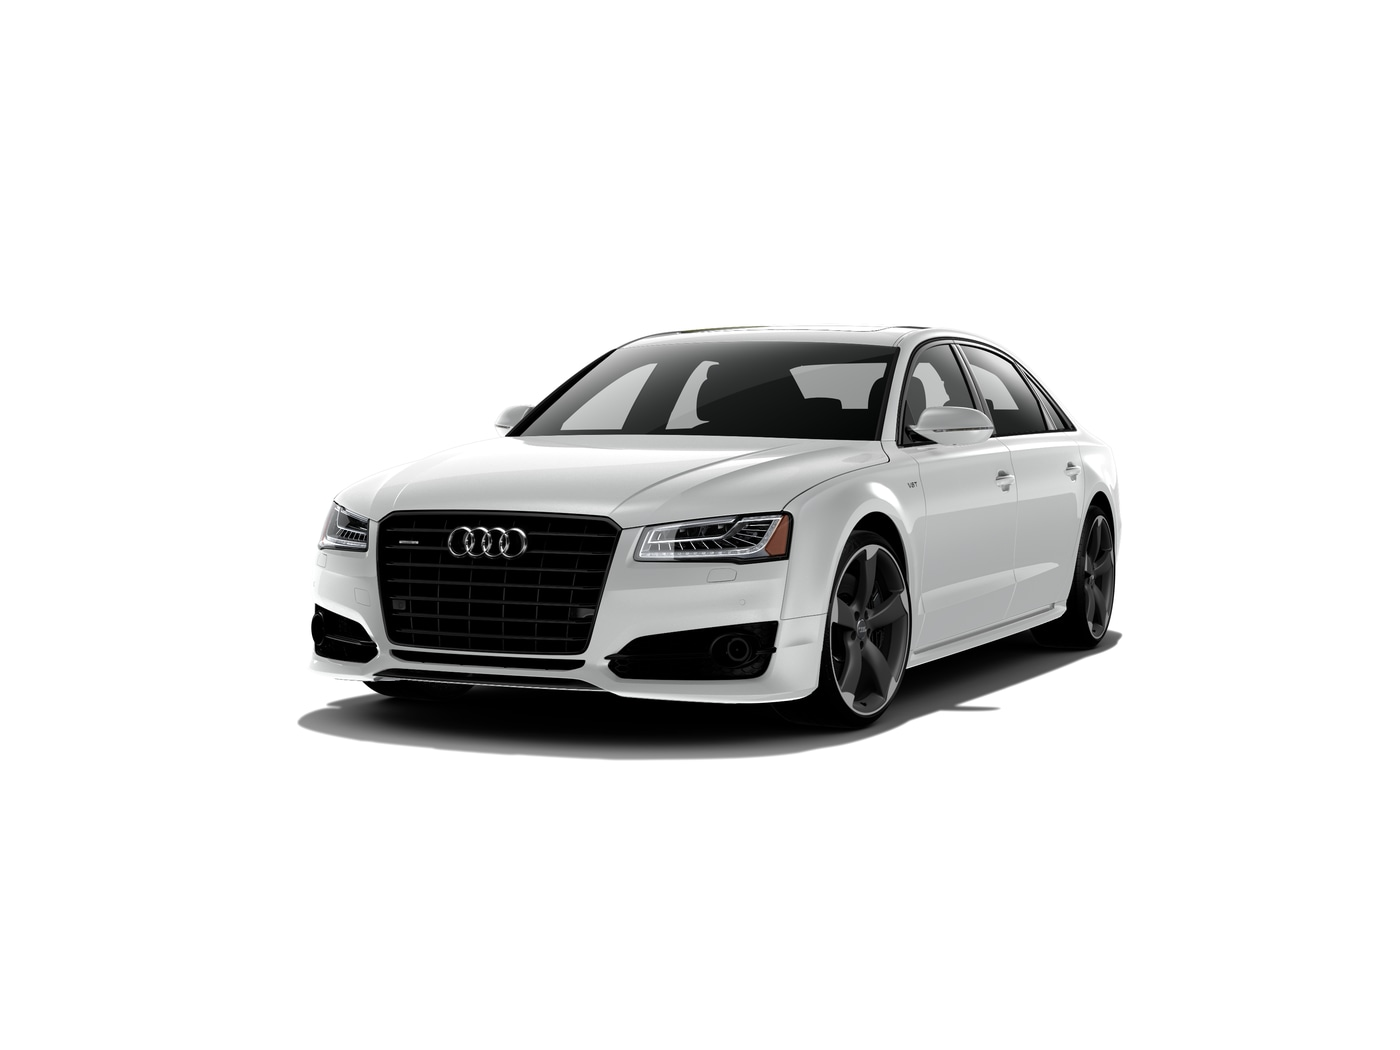 2018 Audi A8 L 3.0T Sedan